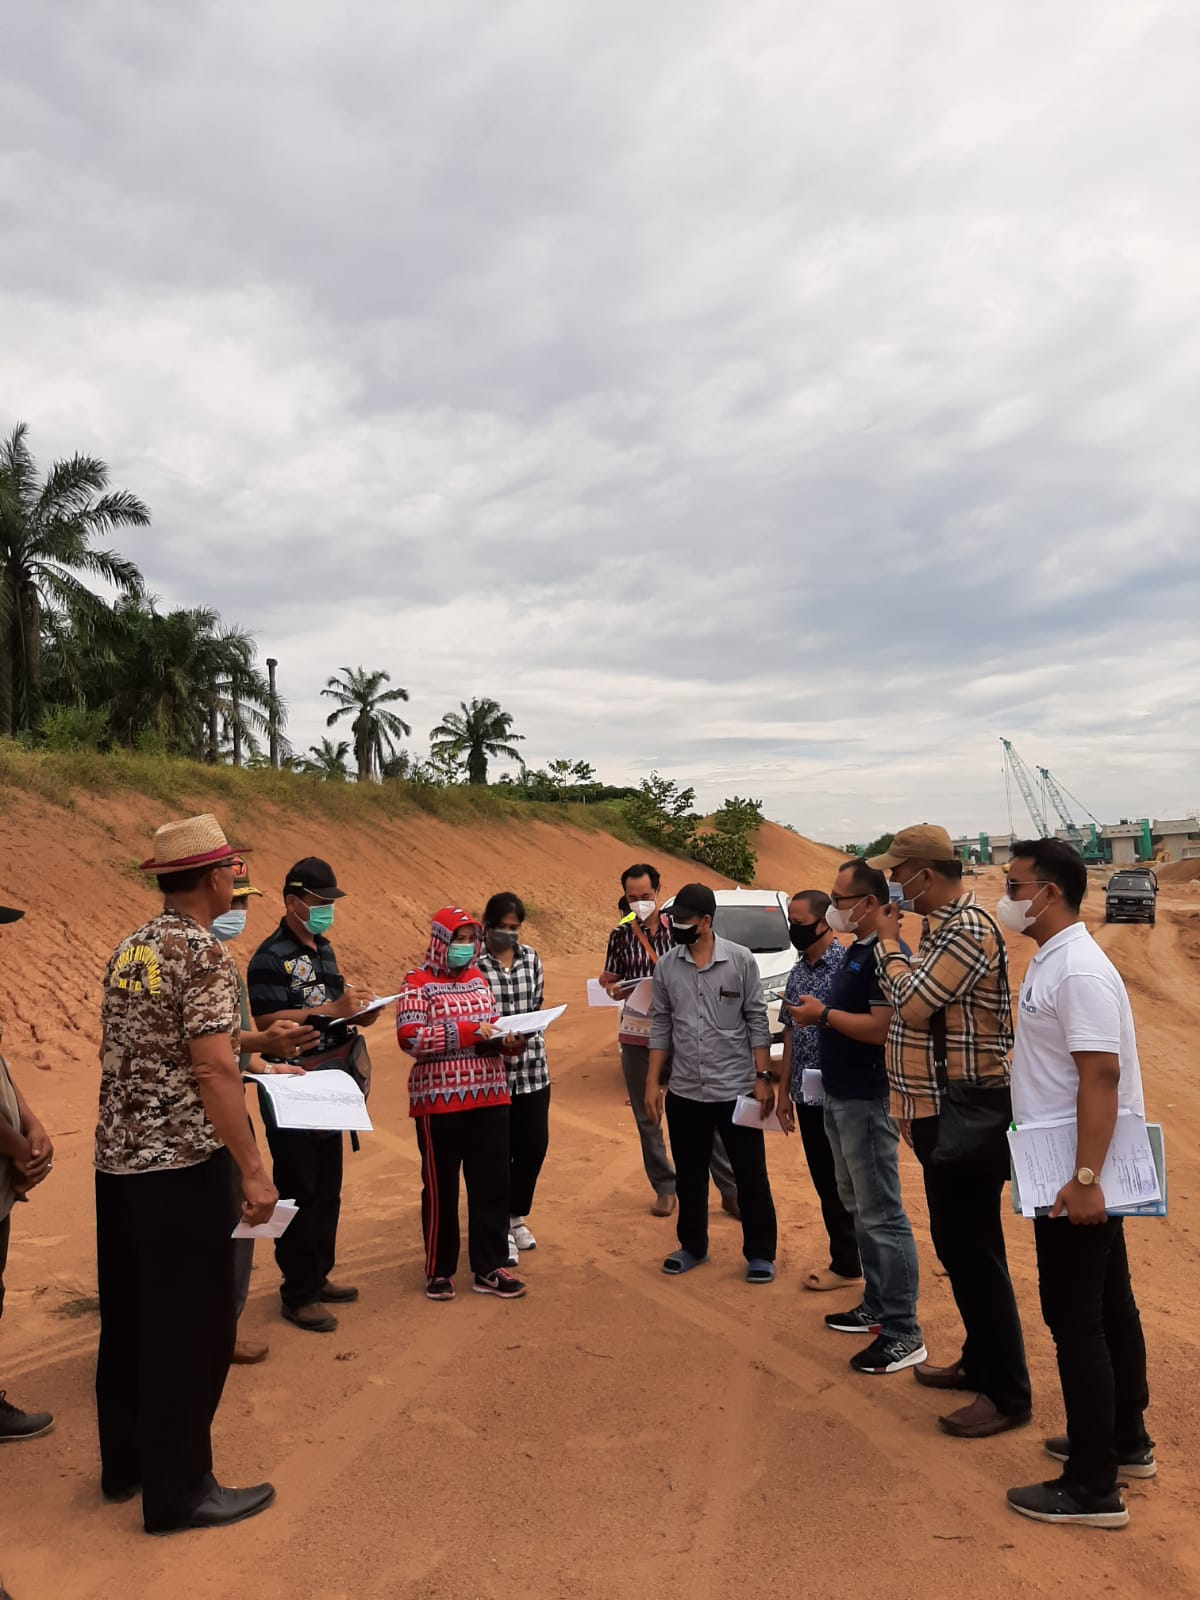 Pengadilan Negeri Simalungun Melakukan Pemeriksaan Setempat di Desa Bandar Tinggi, Kec. Bandar Masilam, Kabupaten Simalungun